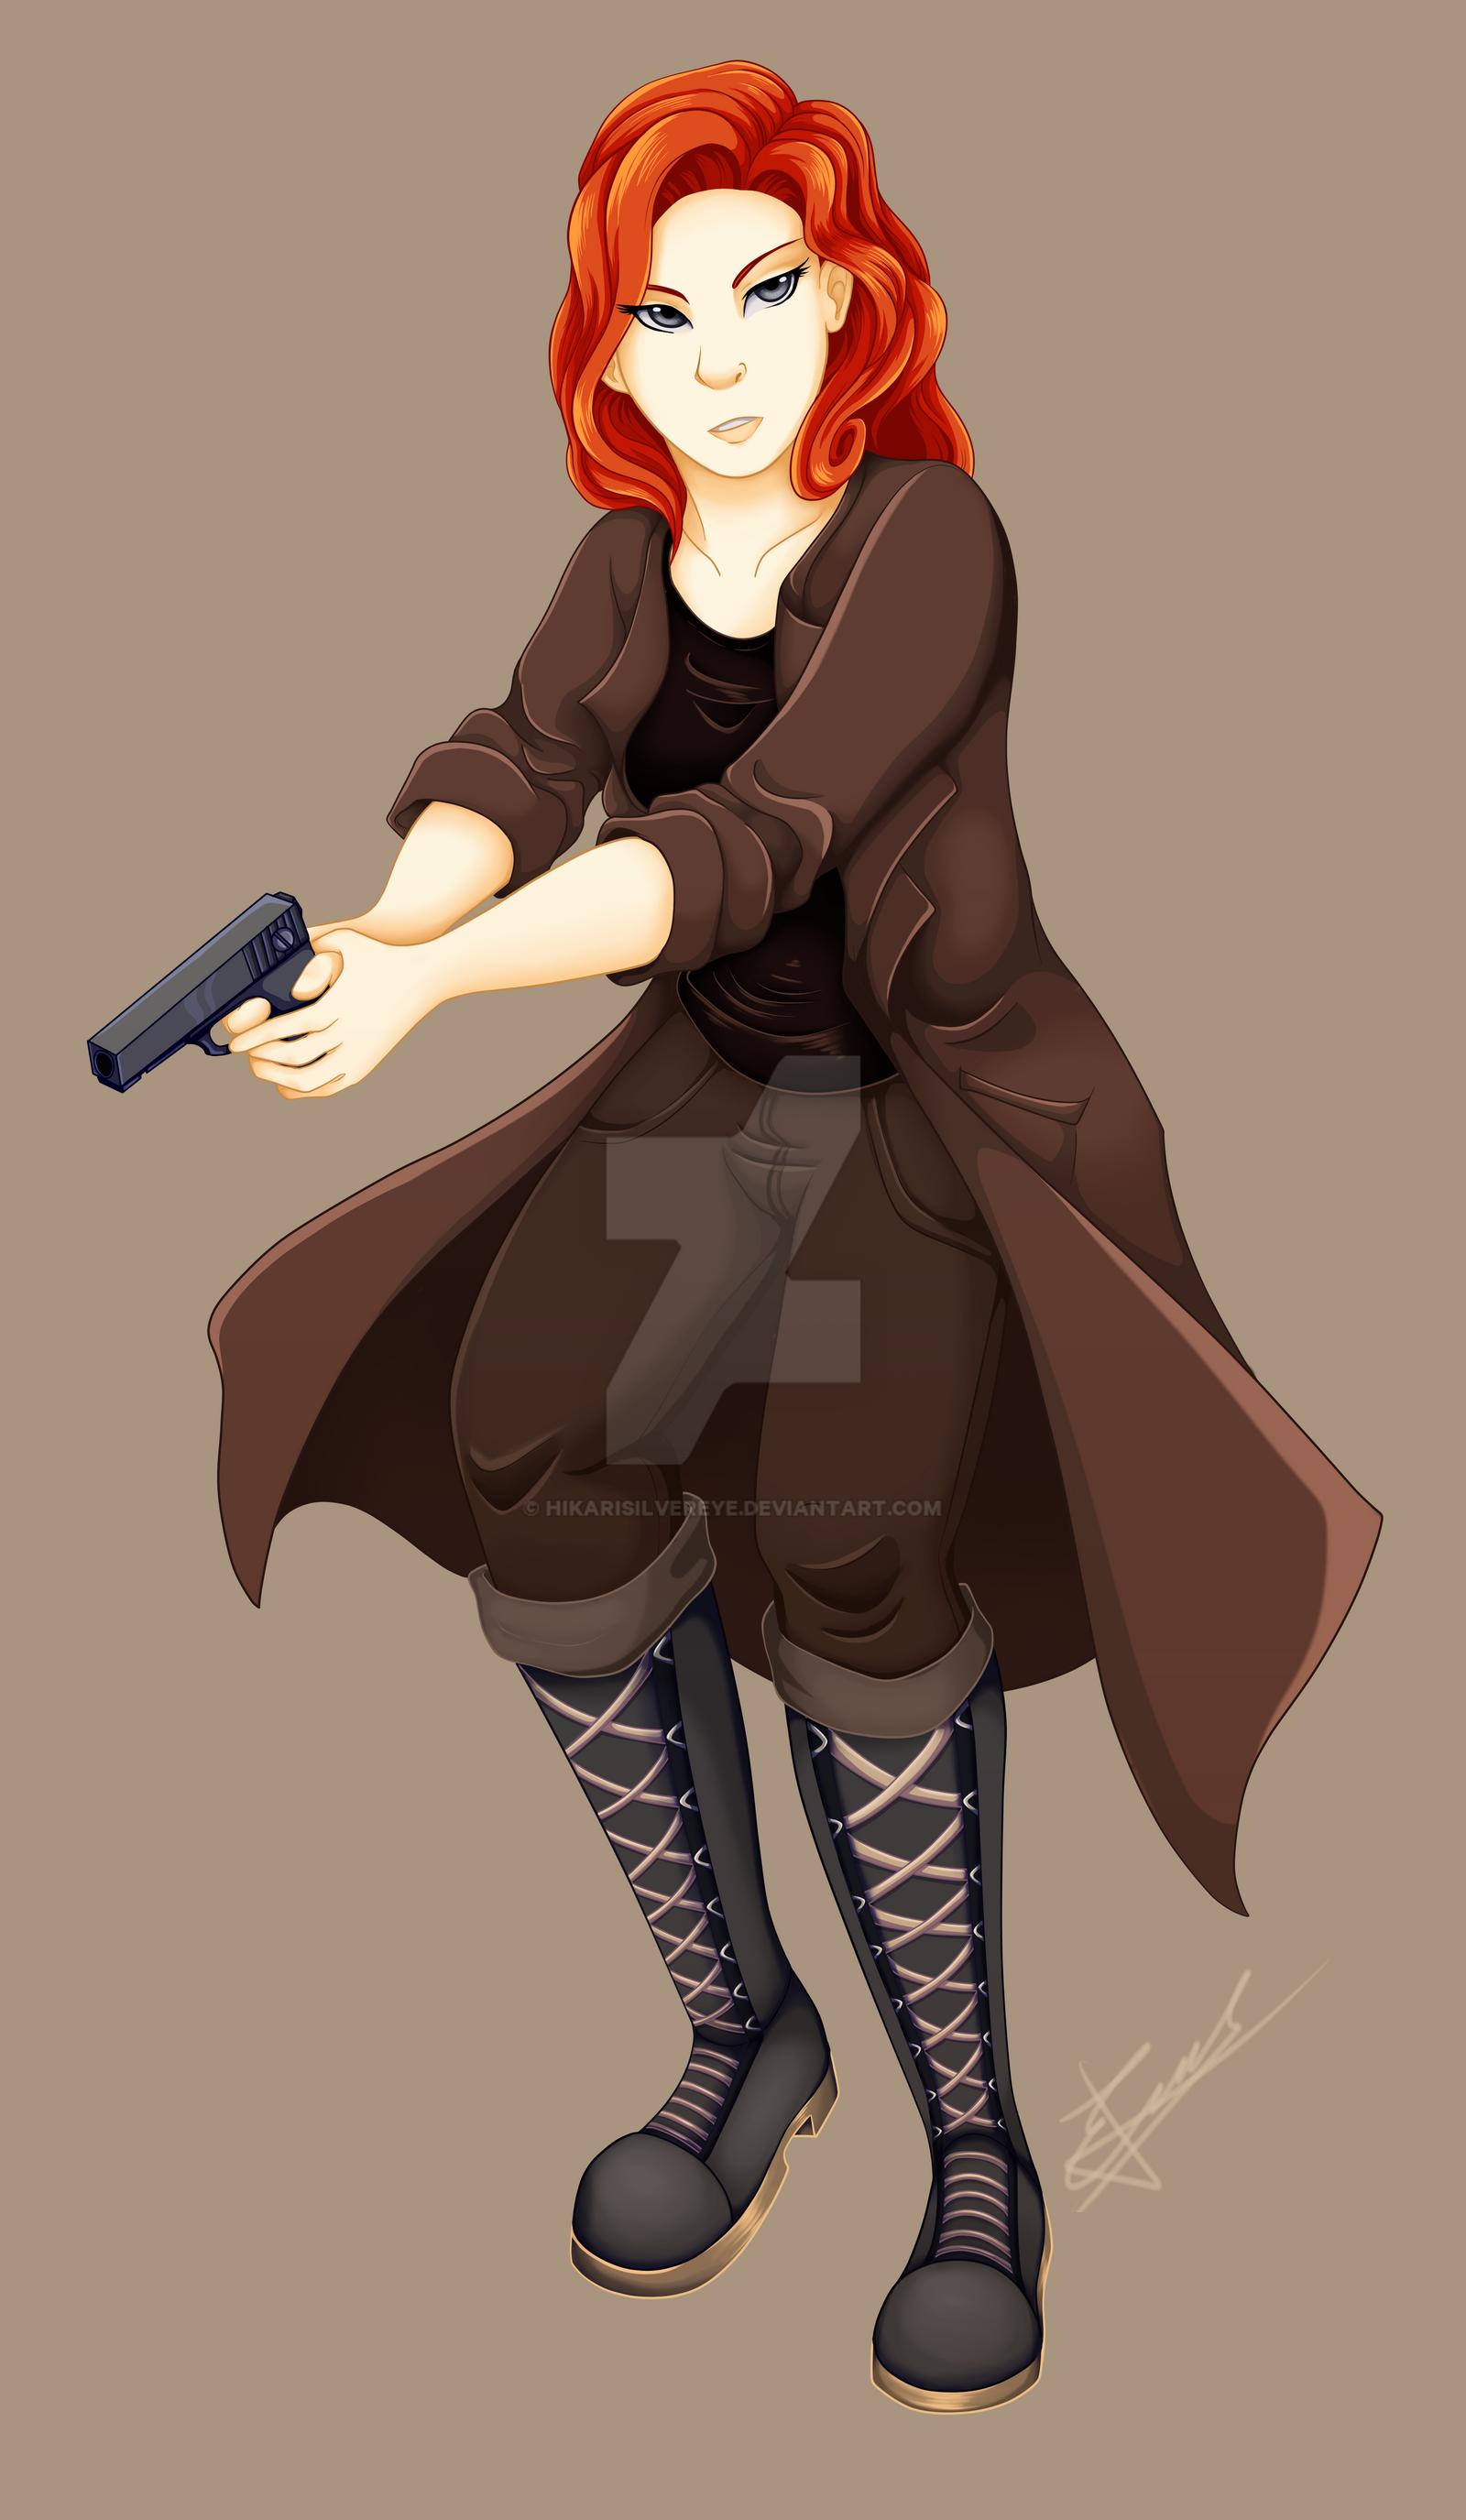 Fiddlestik commission by HikariSilverEye